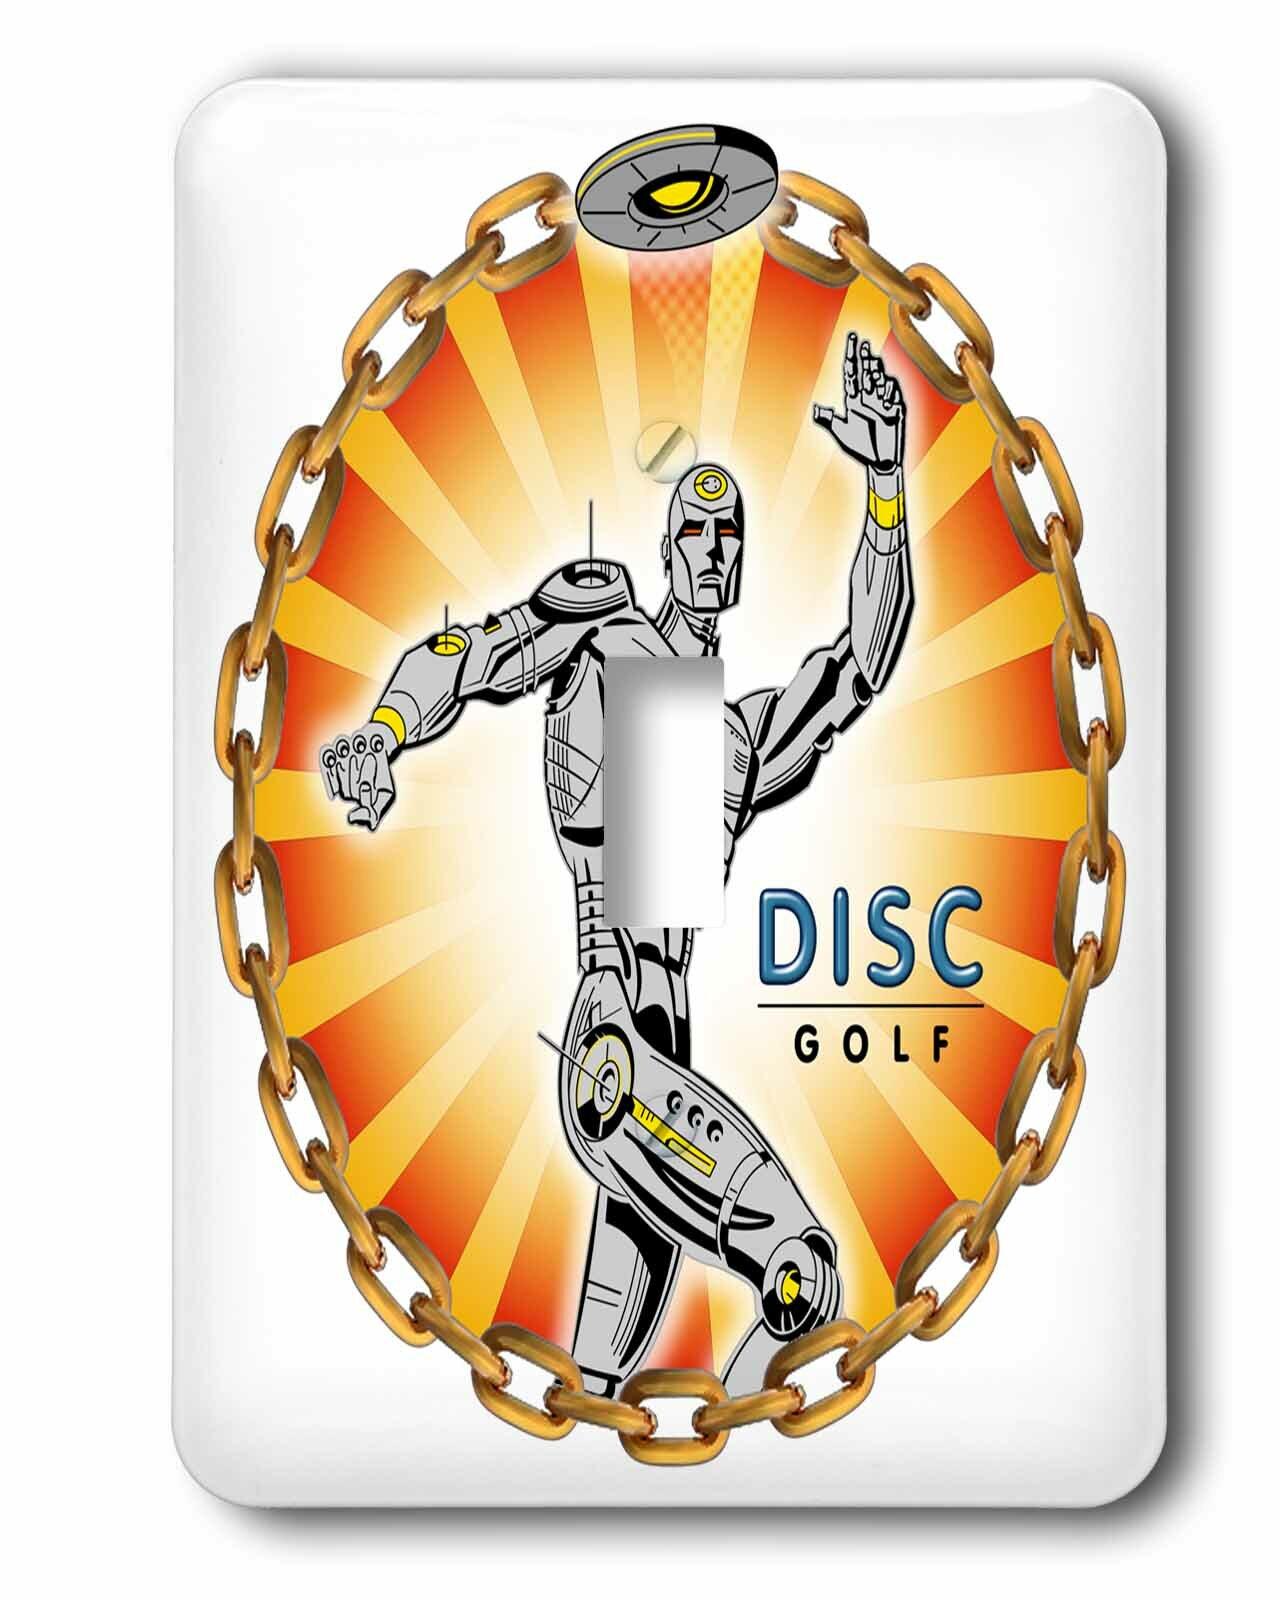 3drose Robot Thrower 2 A Mechanical Robot Throws Frisbee Playing Disc Golf Single Toggle Light Switch Wayfair